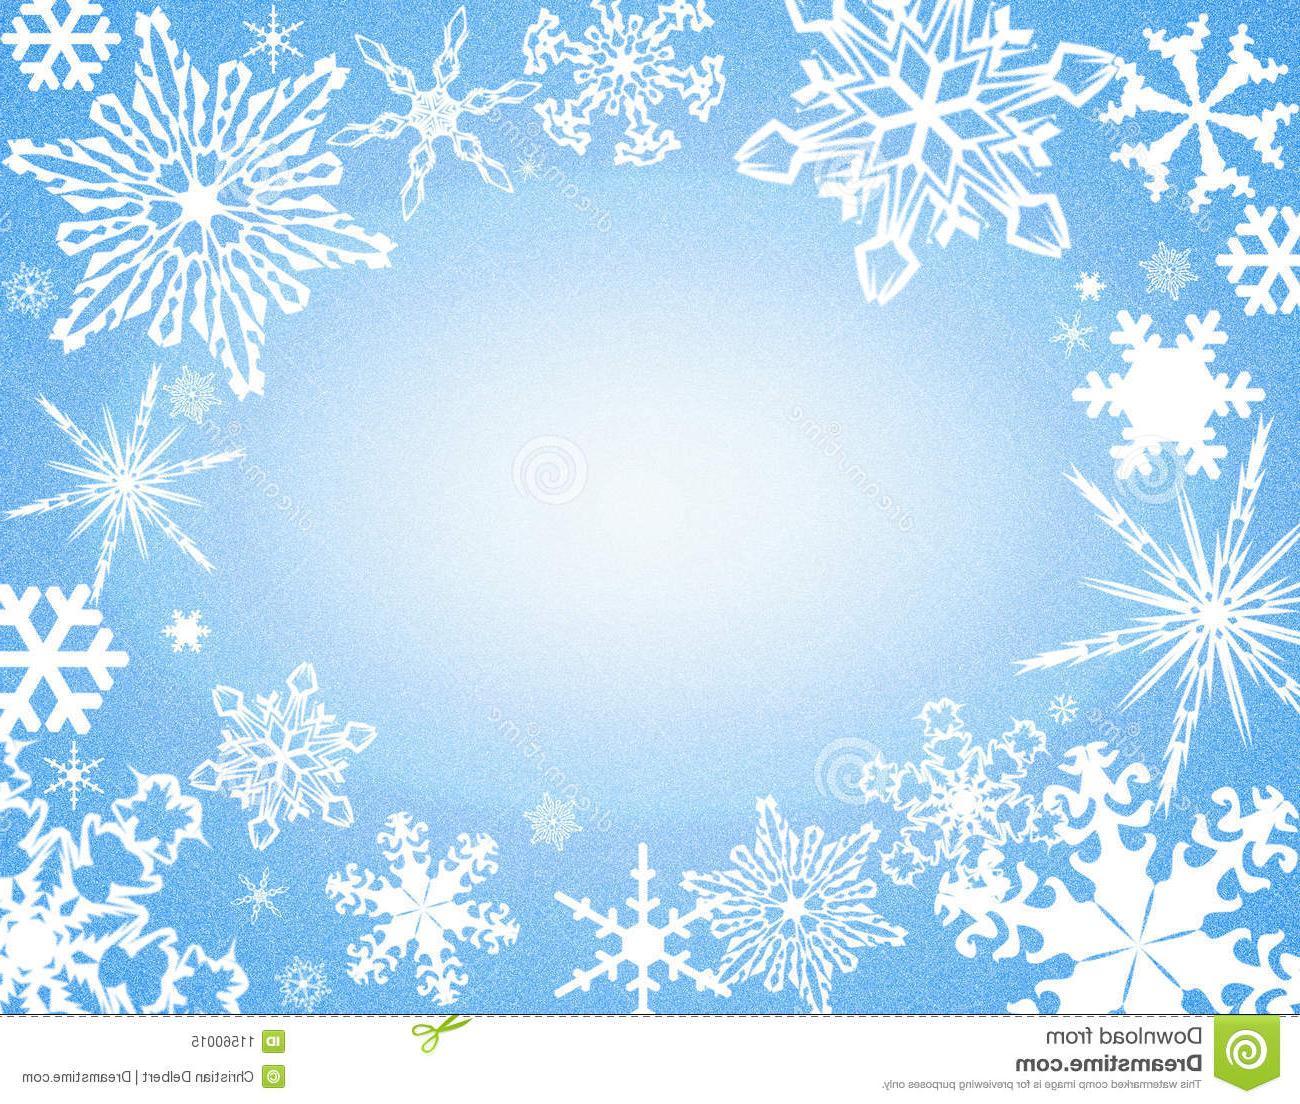 Best HD Blue Snowflake Border Clip Art File Free » Free.